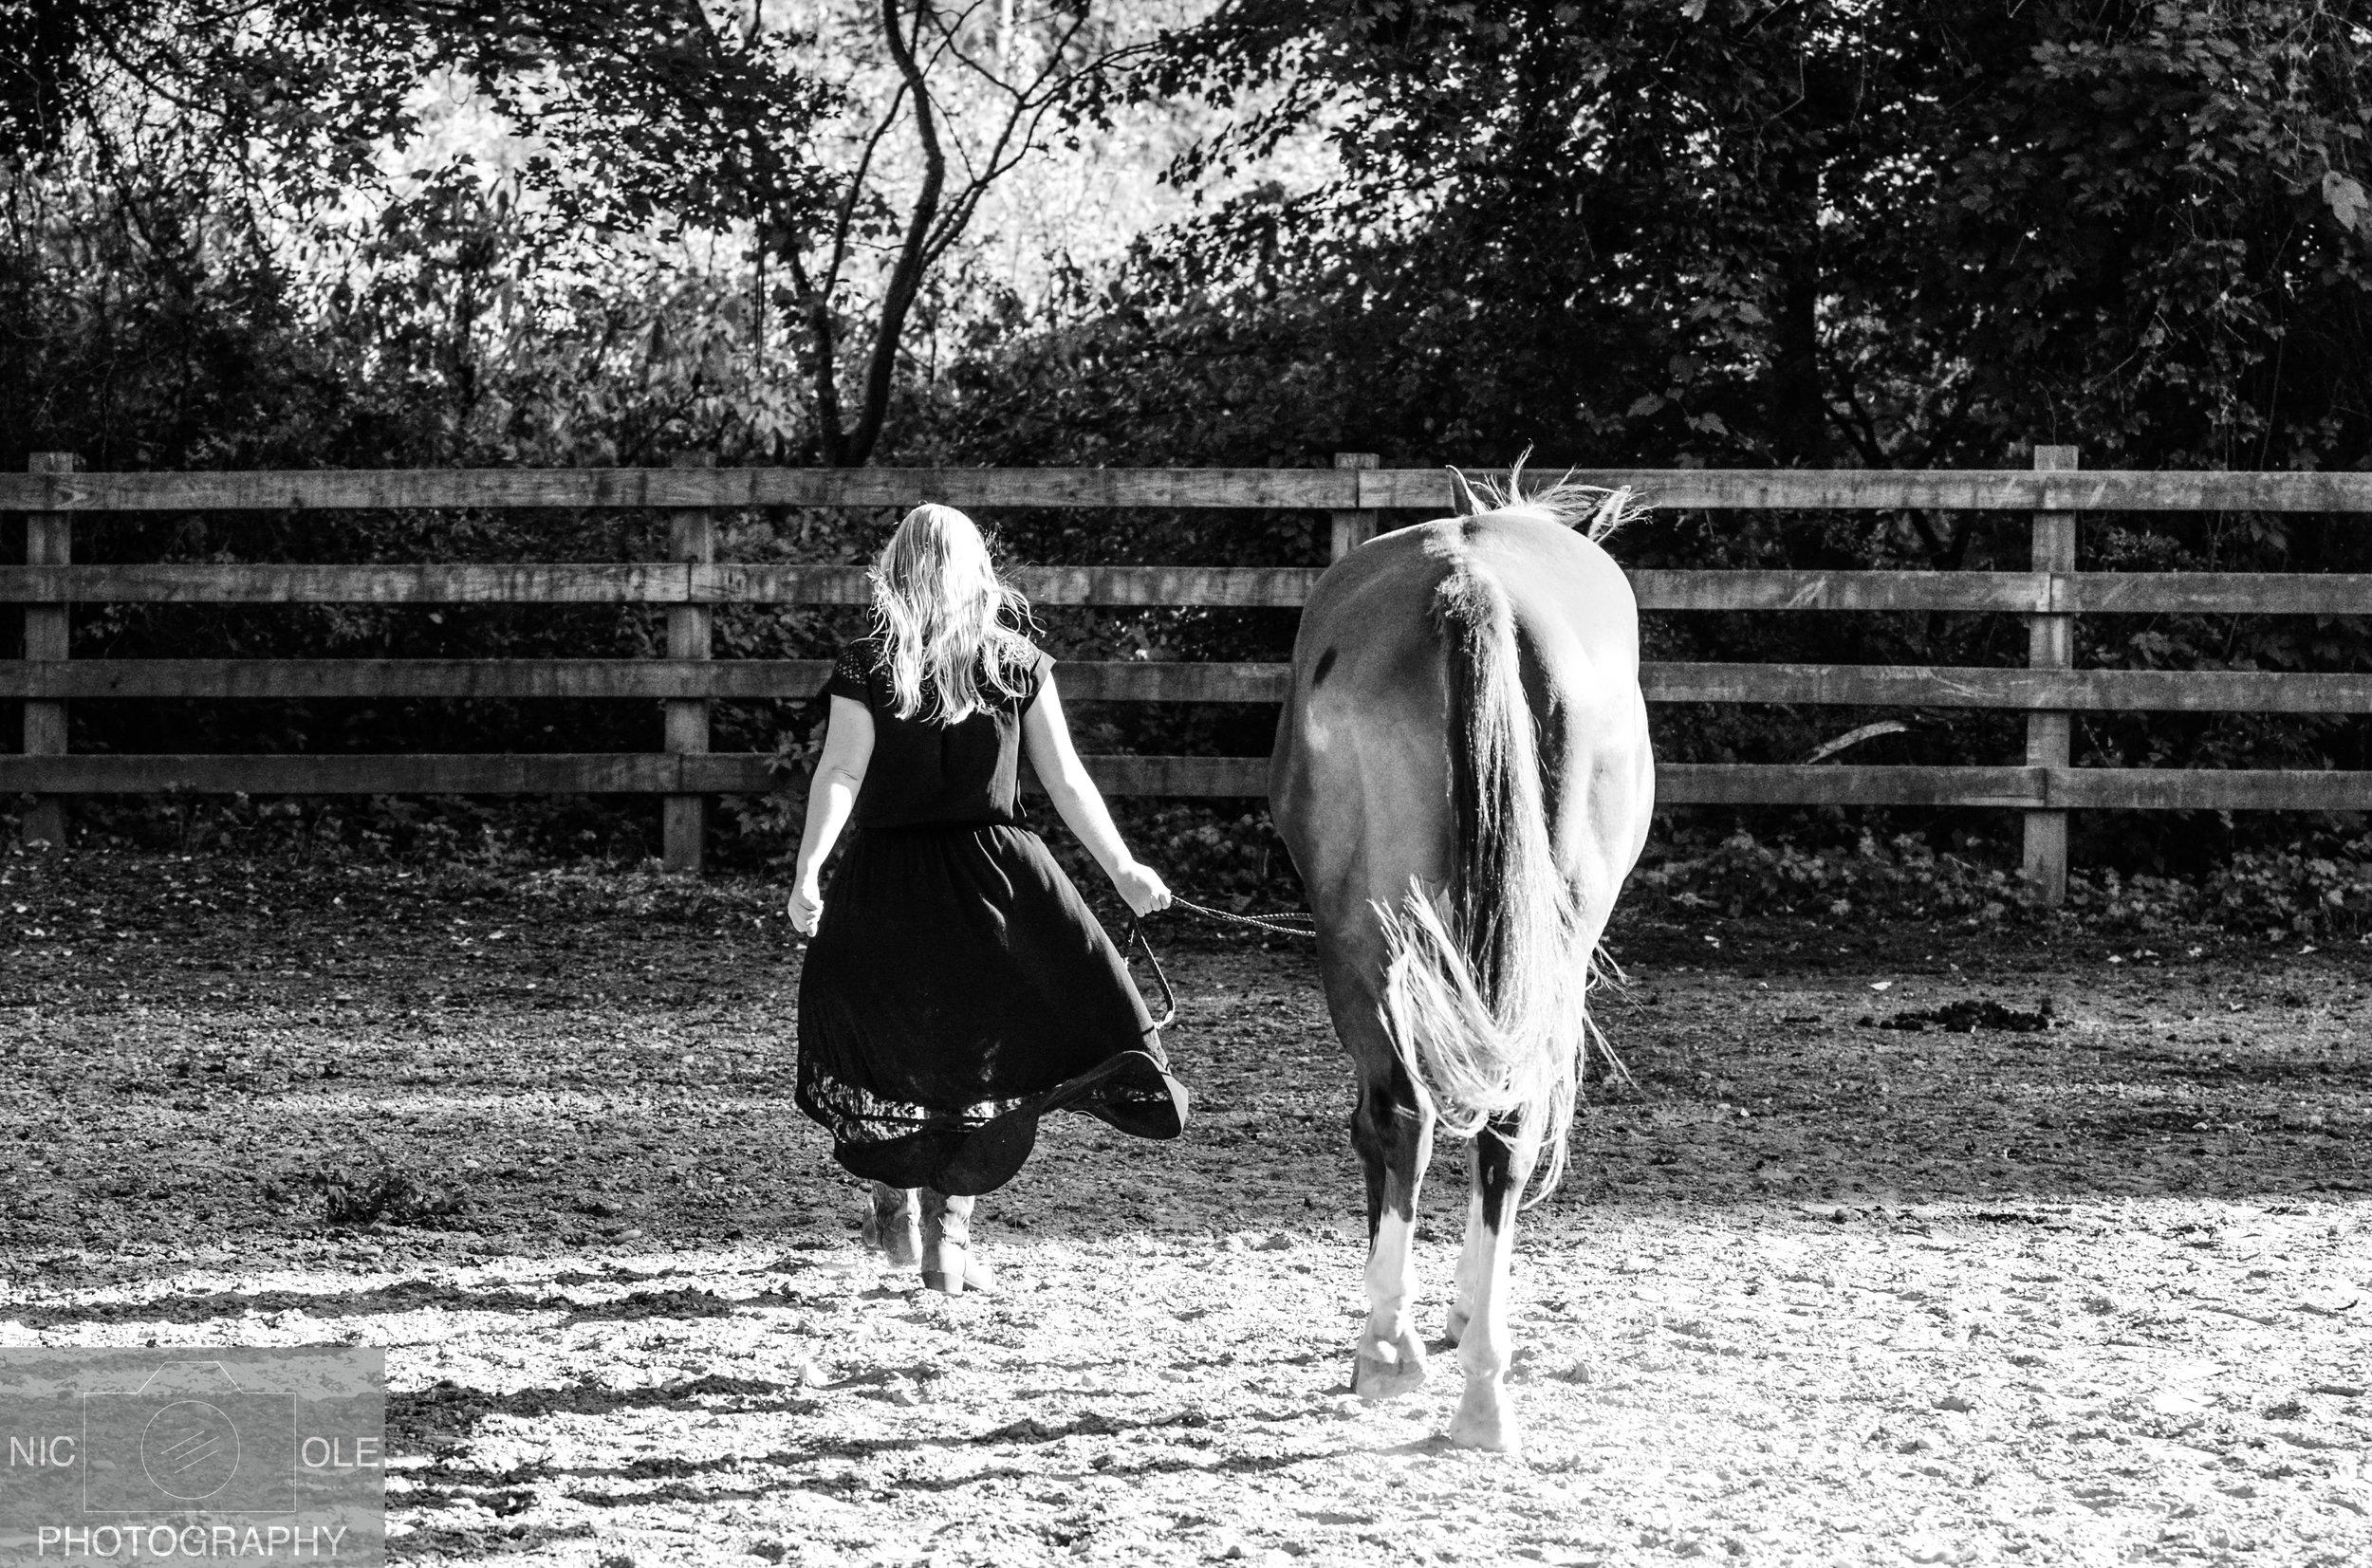 Erica & Albert 10.4.17-NIC.OLE Photography -15.jpg